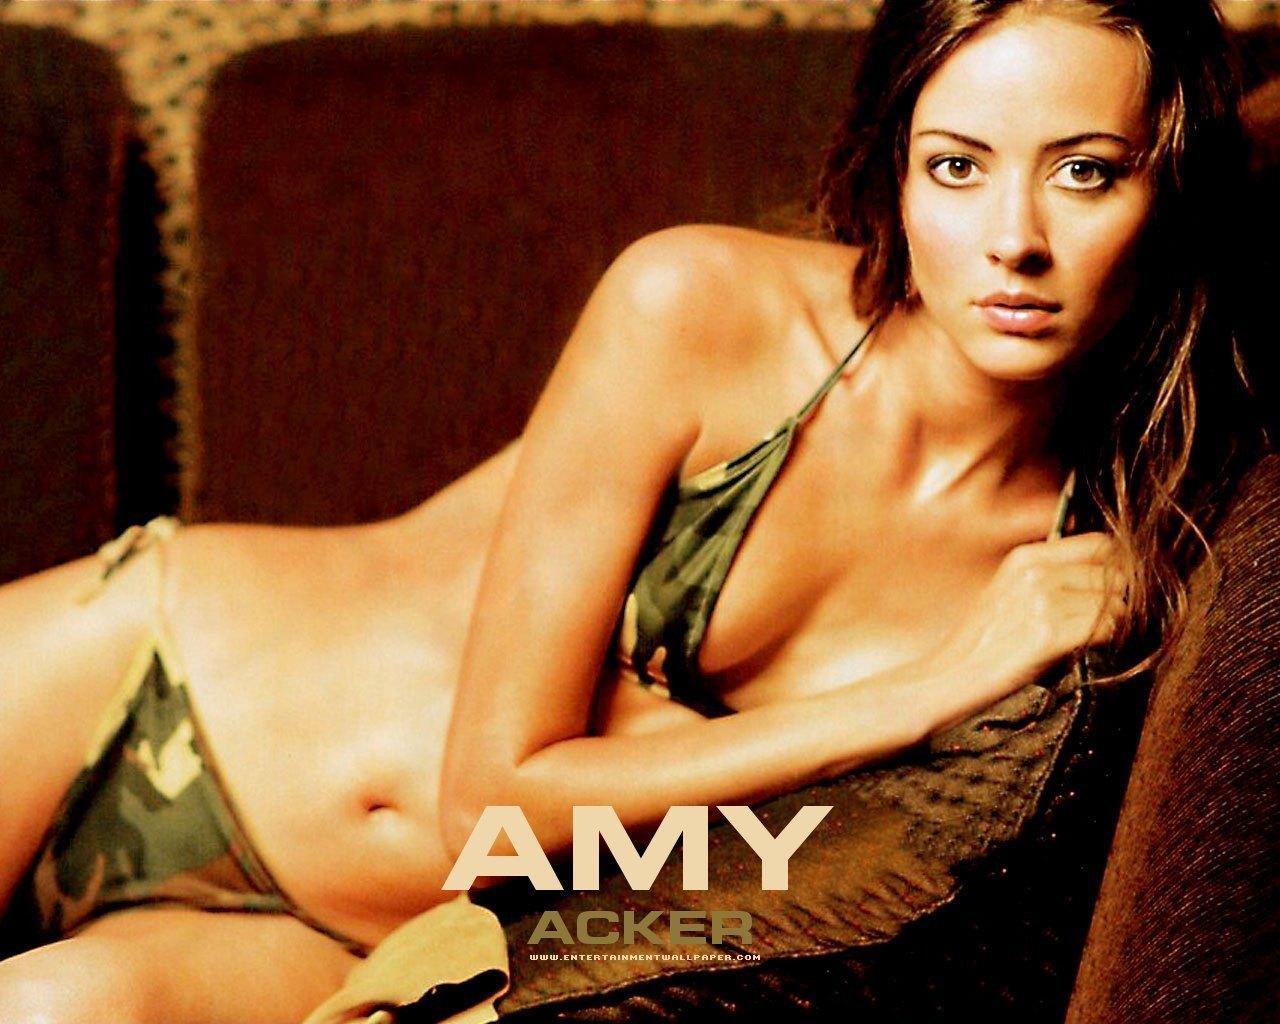 Amy Acker Bikini amy - amy acker wallpaper (2378787) - fanpop